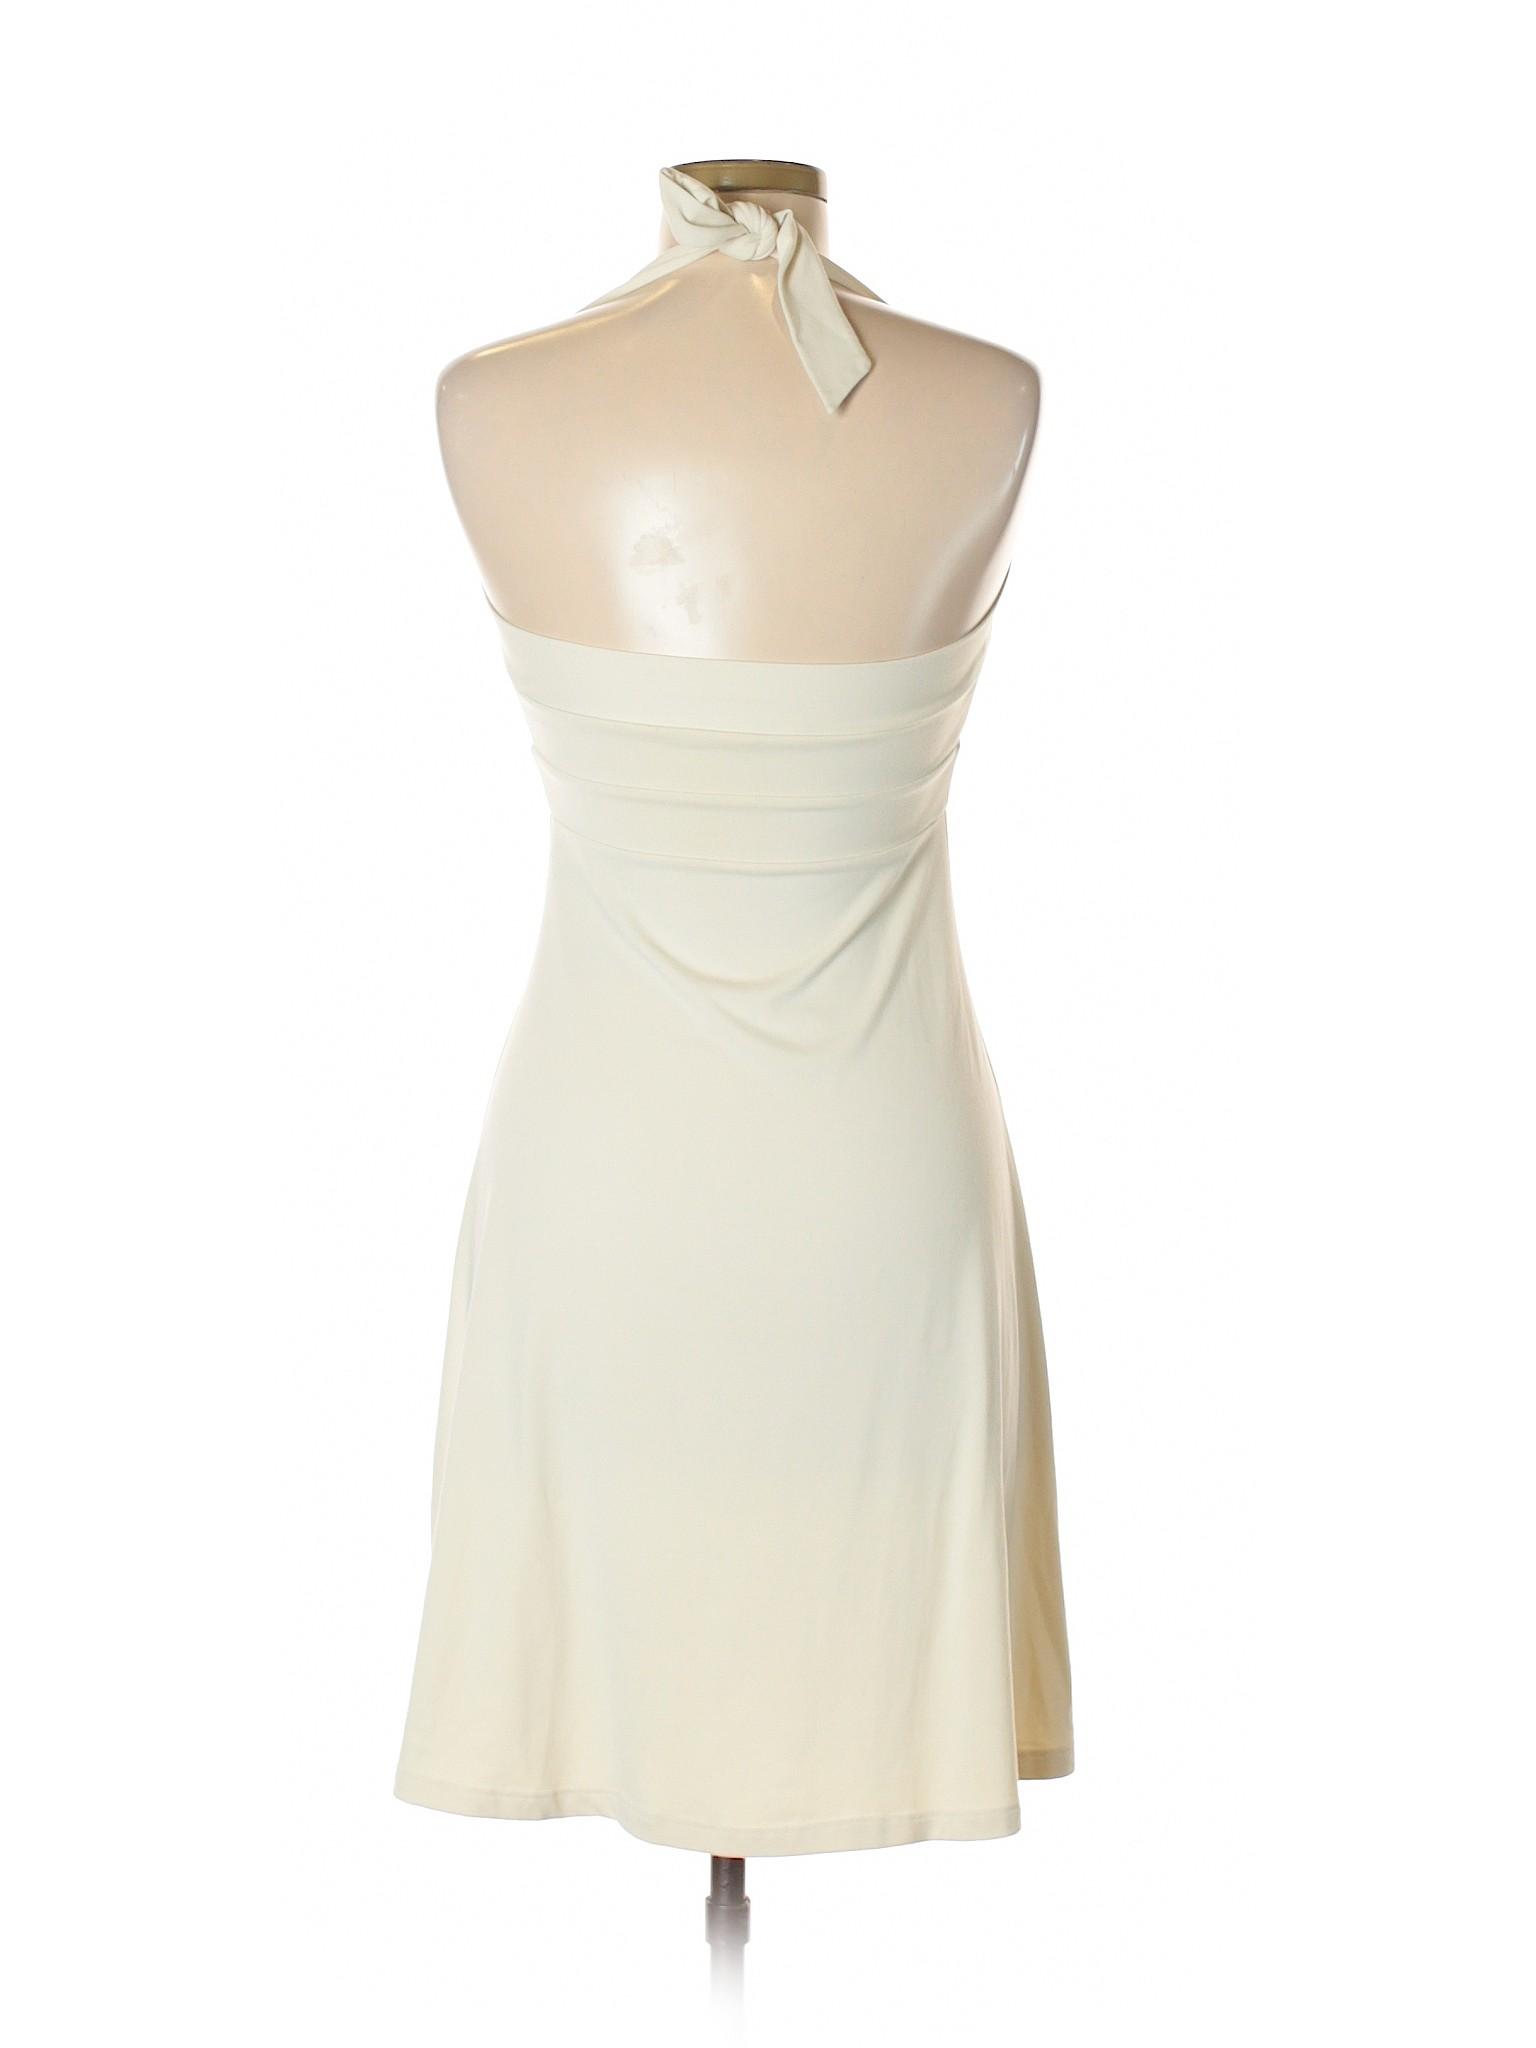 Casual Casual Monaco Susana Dress Selling Selling Susana Dress Susana Casual Monaco Dress Selling Monaco Selling xqgnT0wBRq